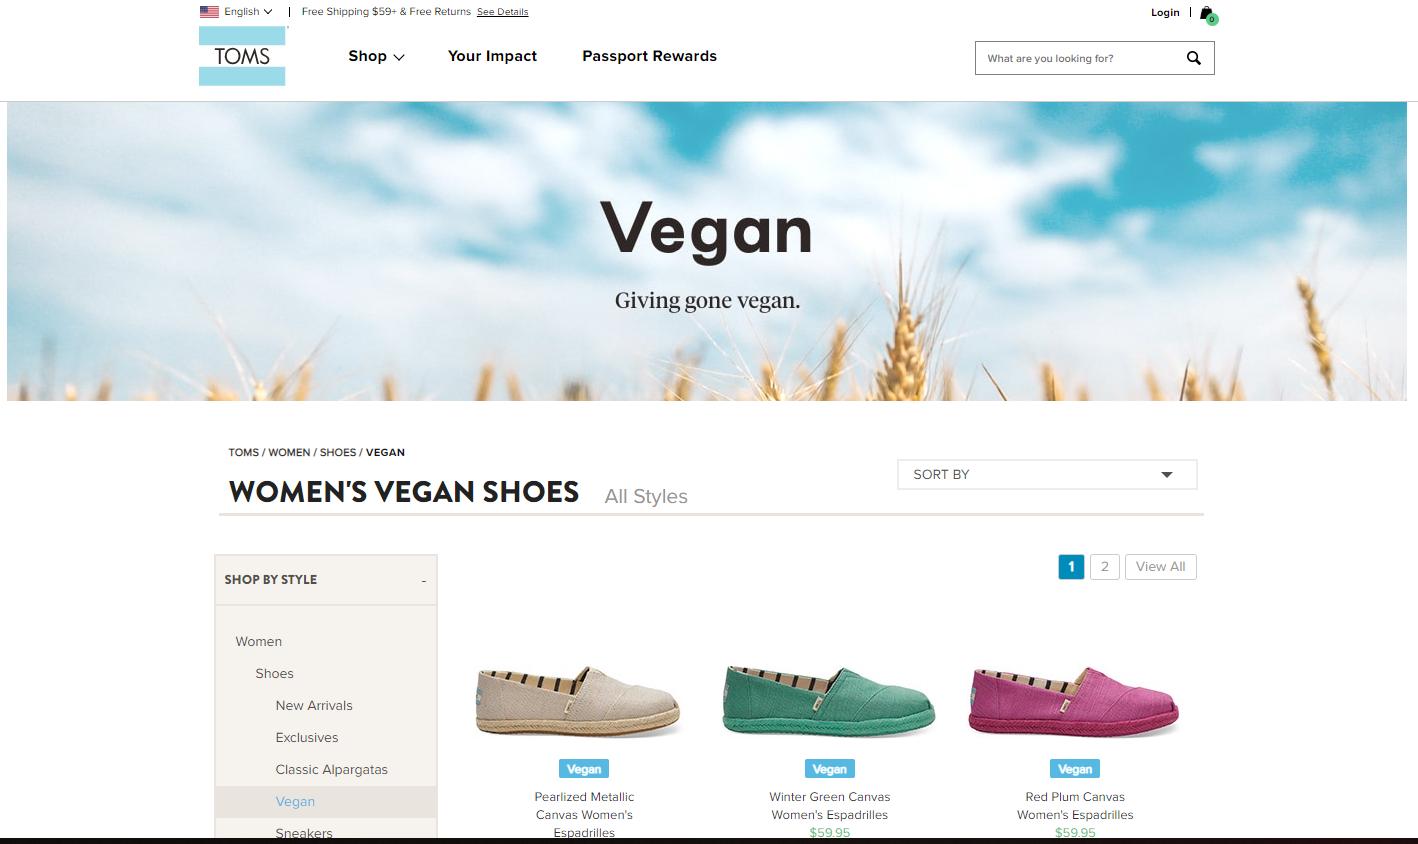 TOMS Vegan Shoes